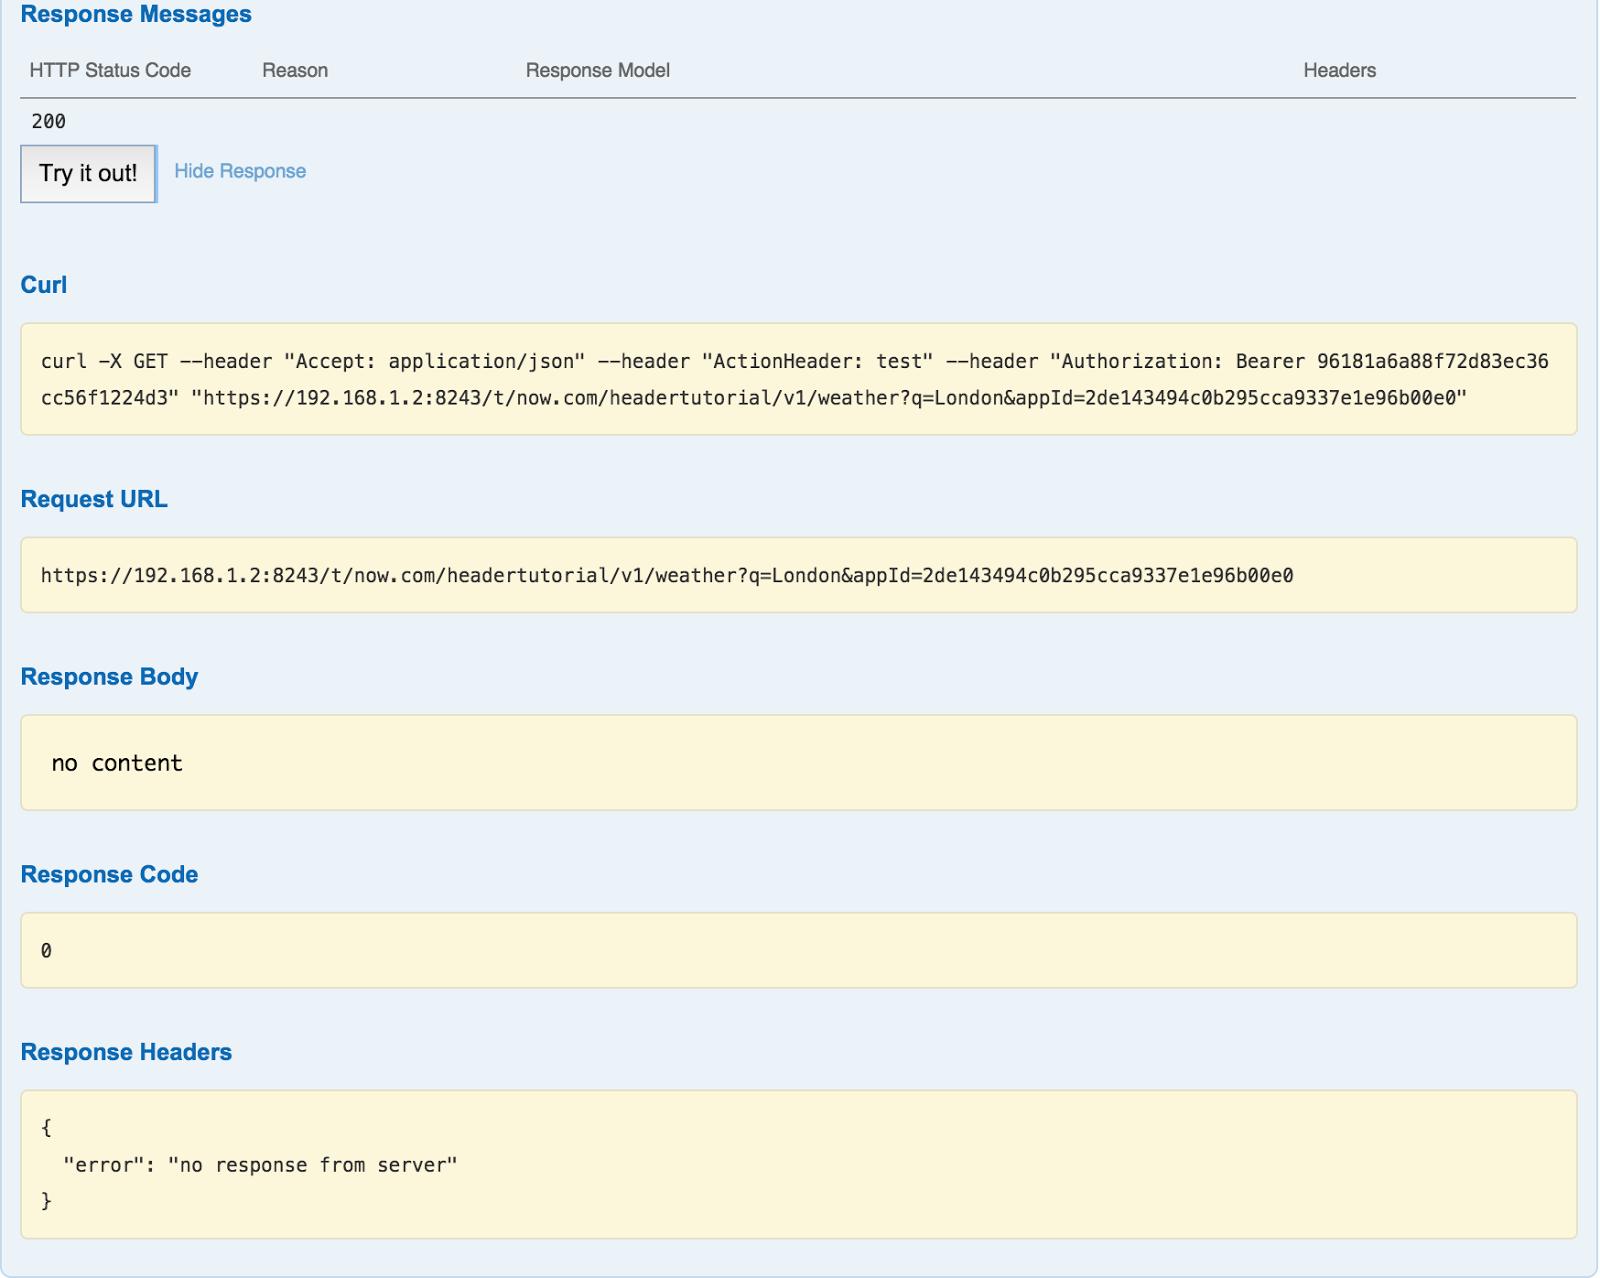 BAKIlisation: WSO2 API Manager Using custom headers via